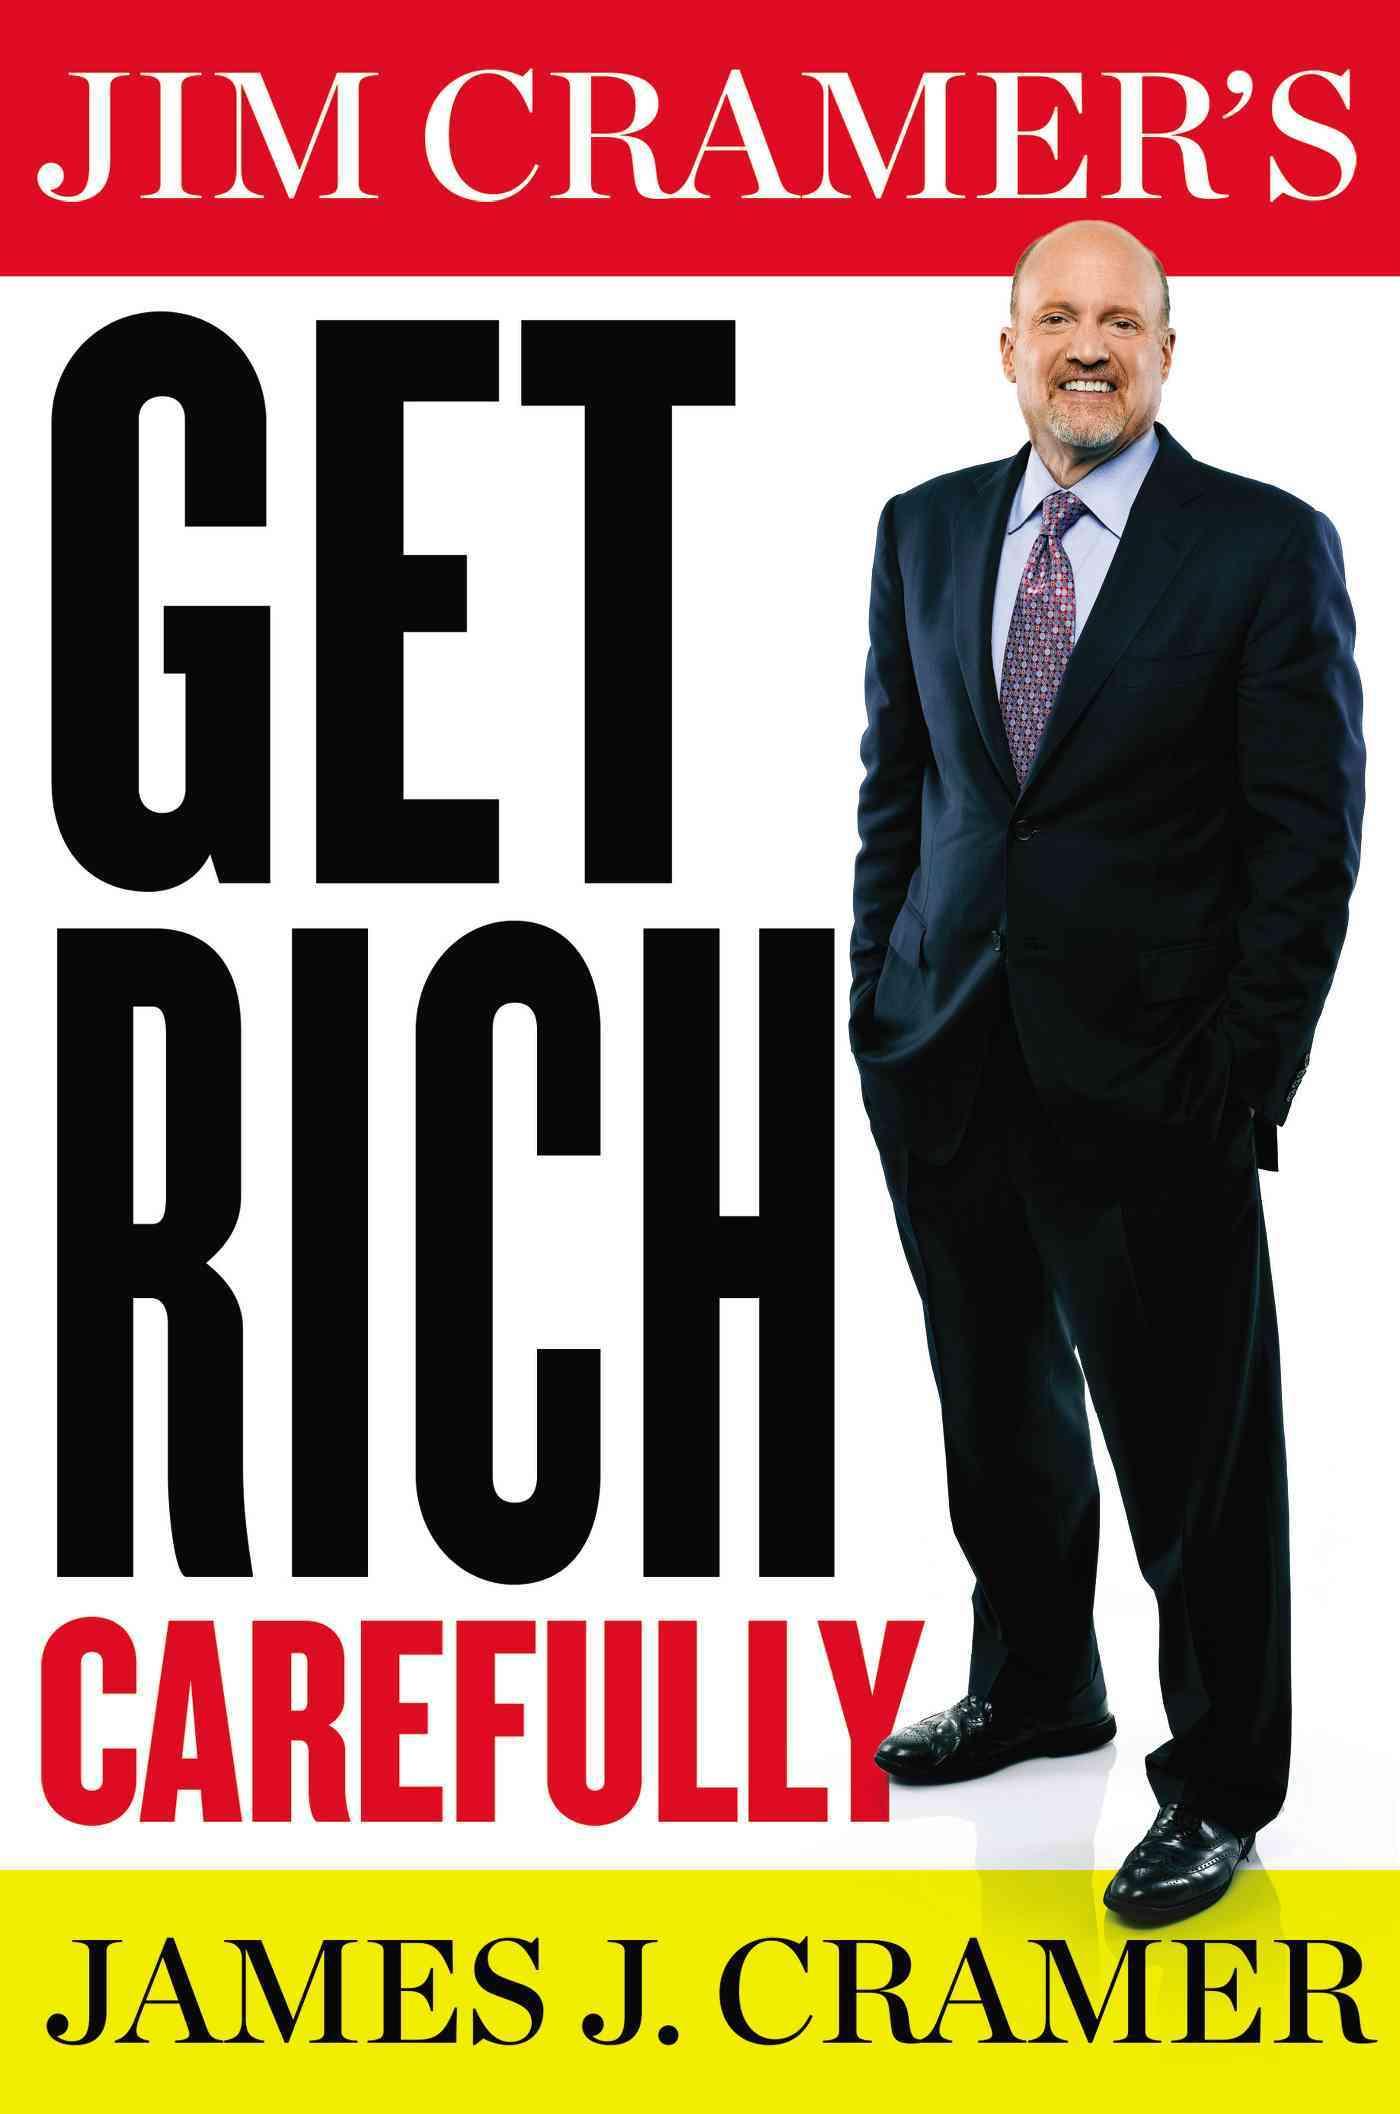 Jim Cramer's Get Rich Carefully (Hardcover)